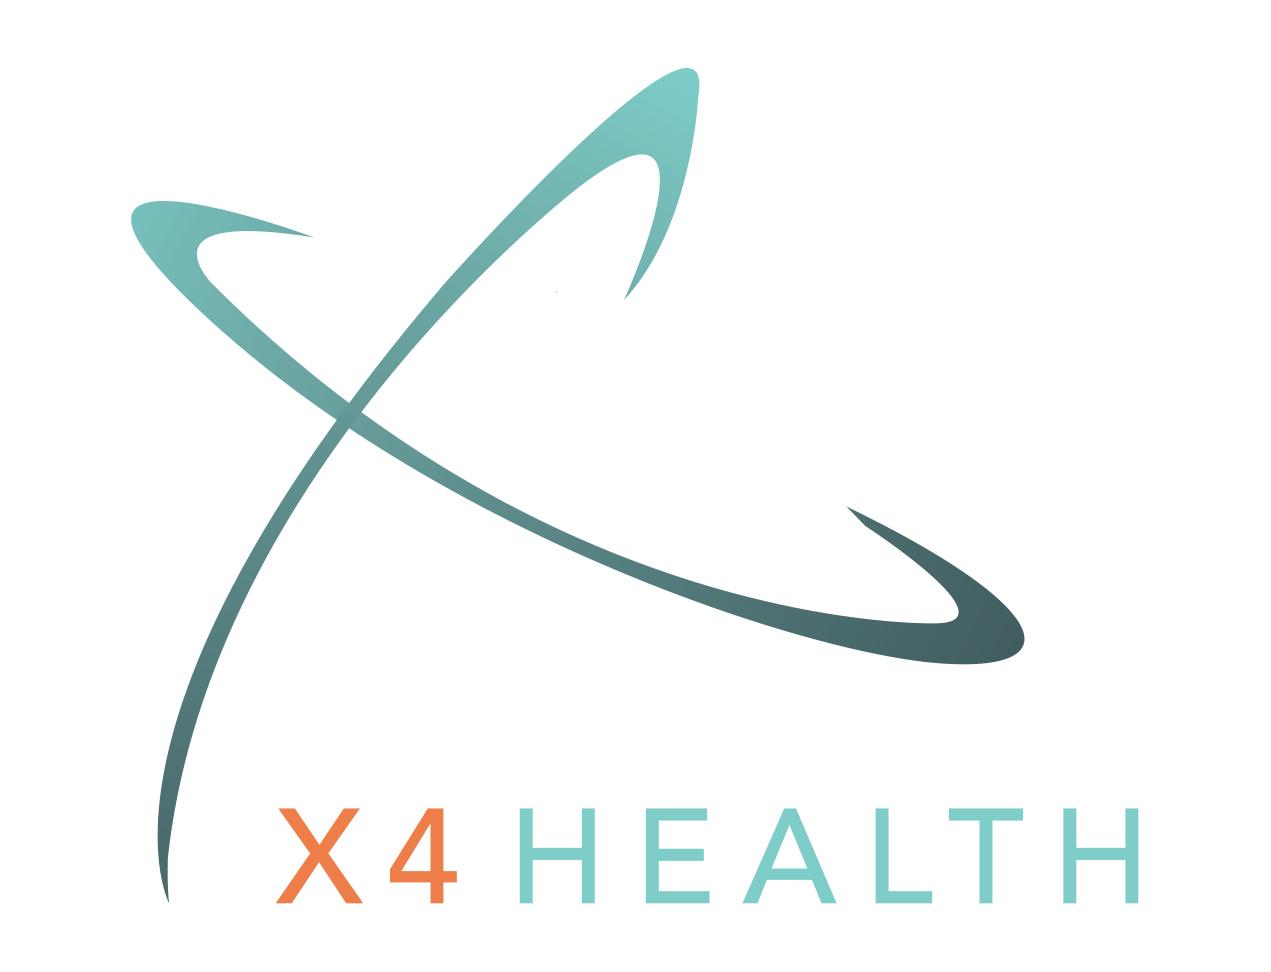 X4 Health